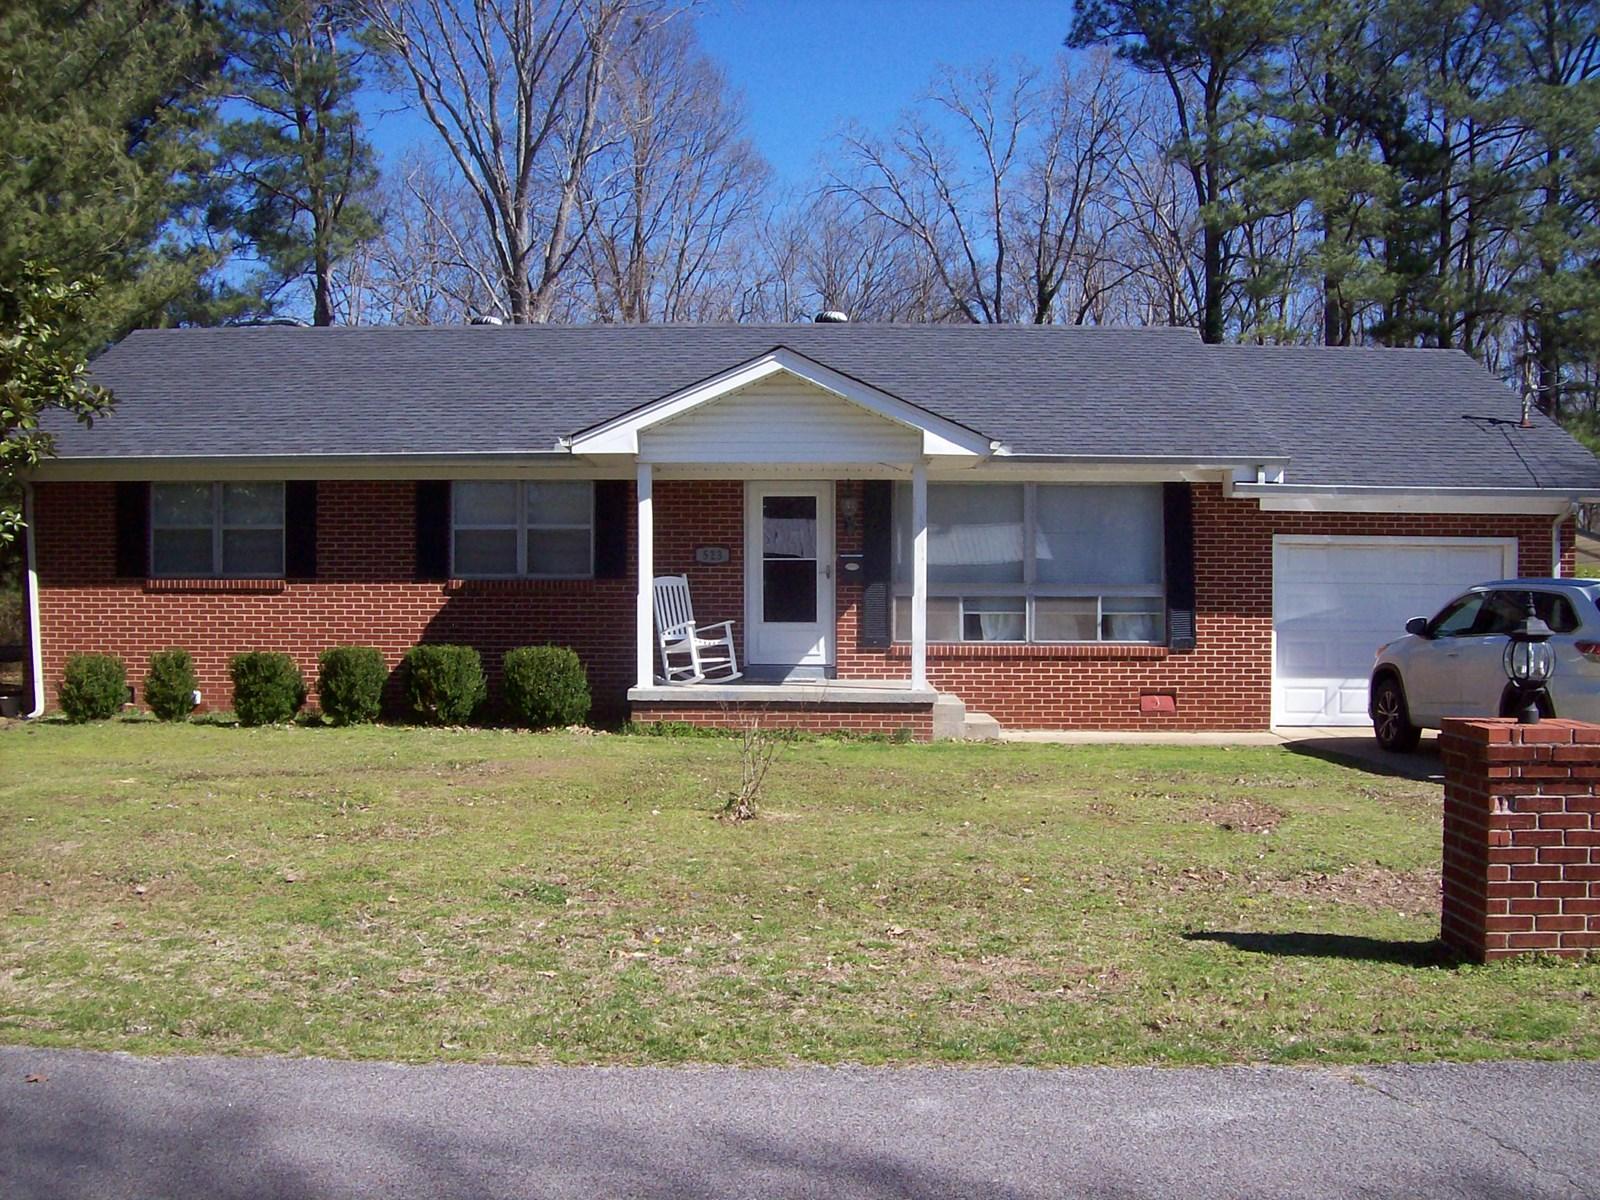 Brick Home in Hohenwald, TN.